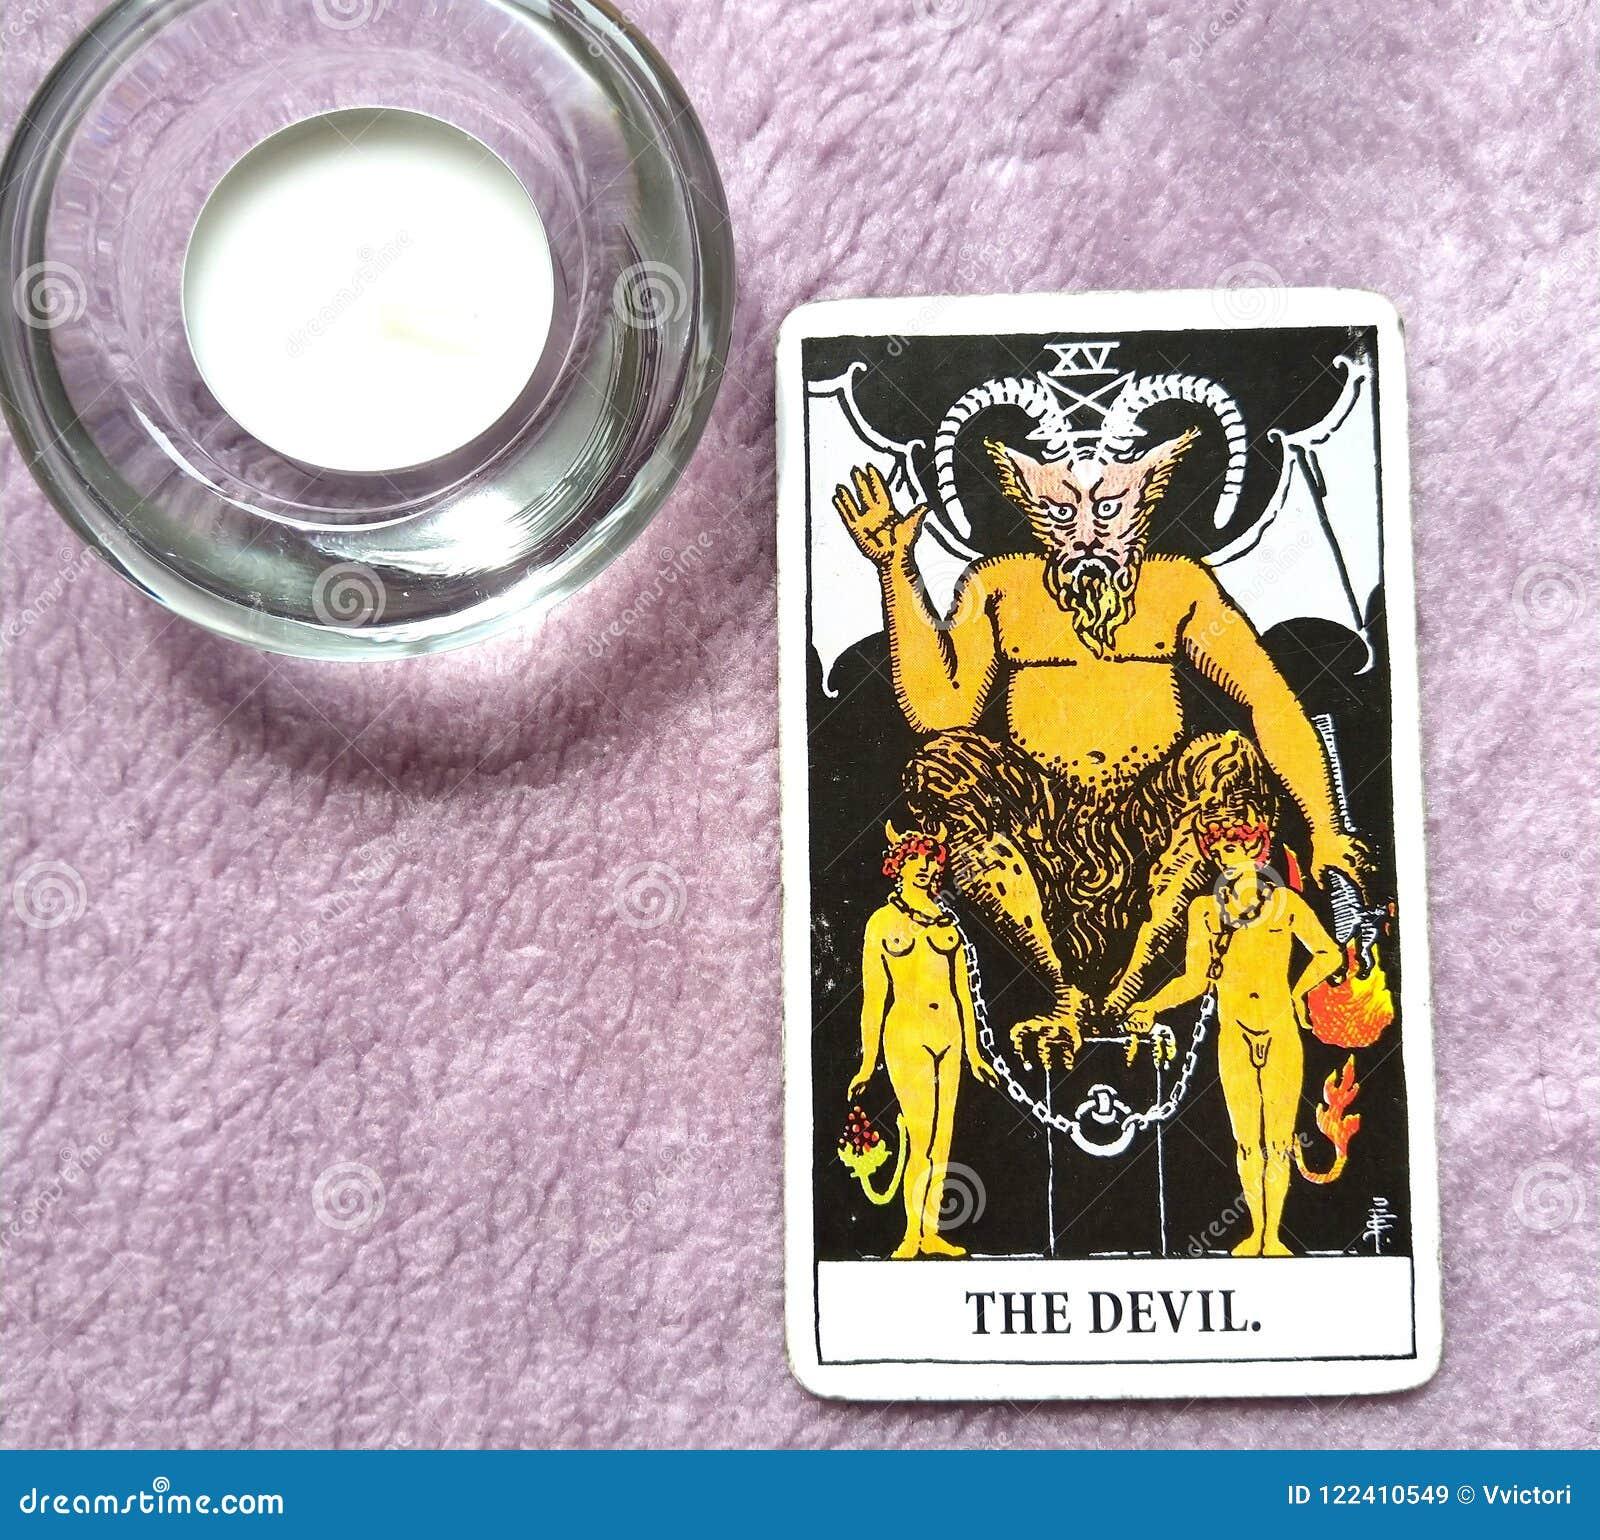 Die Teufel-Tarock-Karten-Knechtschaft, Versuchung, Versklavung, Materialismus, Sucht